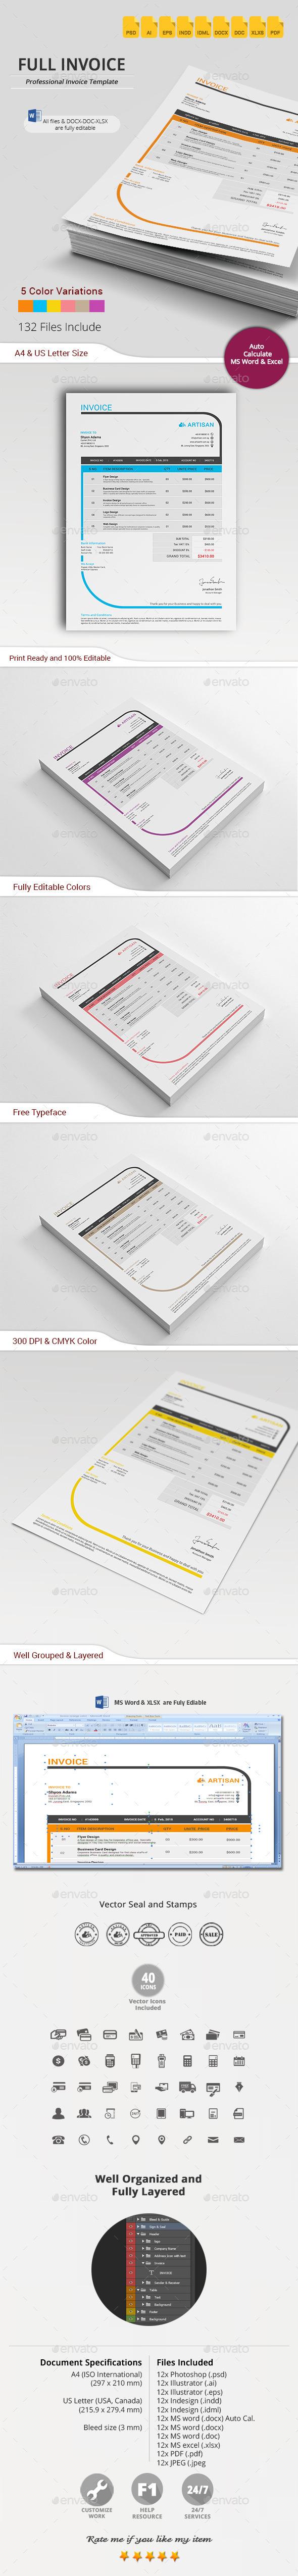 Invoice Proposals Invoices Stationery Download Here Https Graphicriver Net Item Invoice 10091006 Ref Alena99 Invoice Design Invoice Template Invoicing